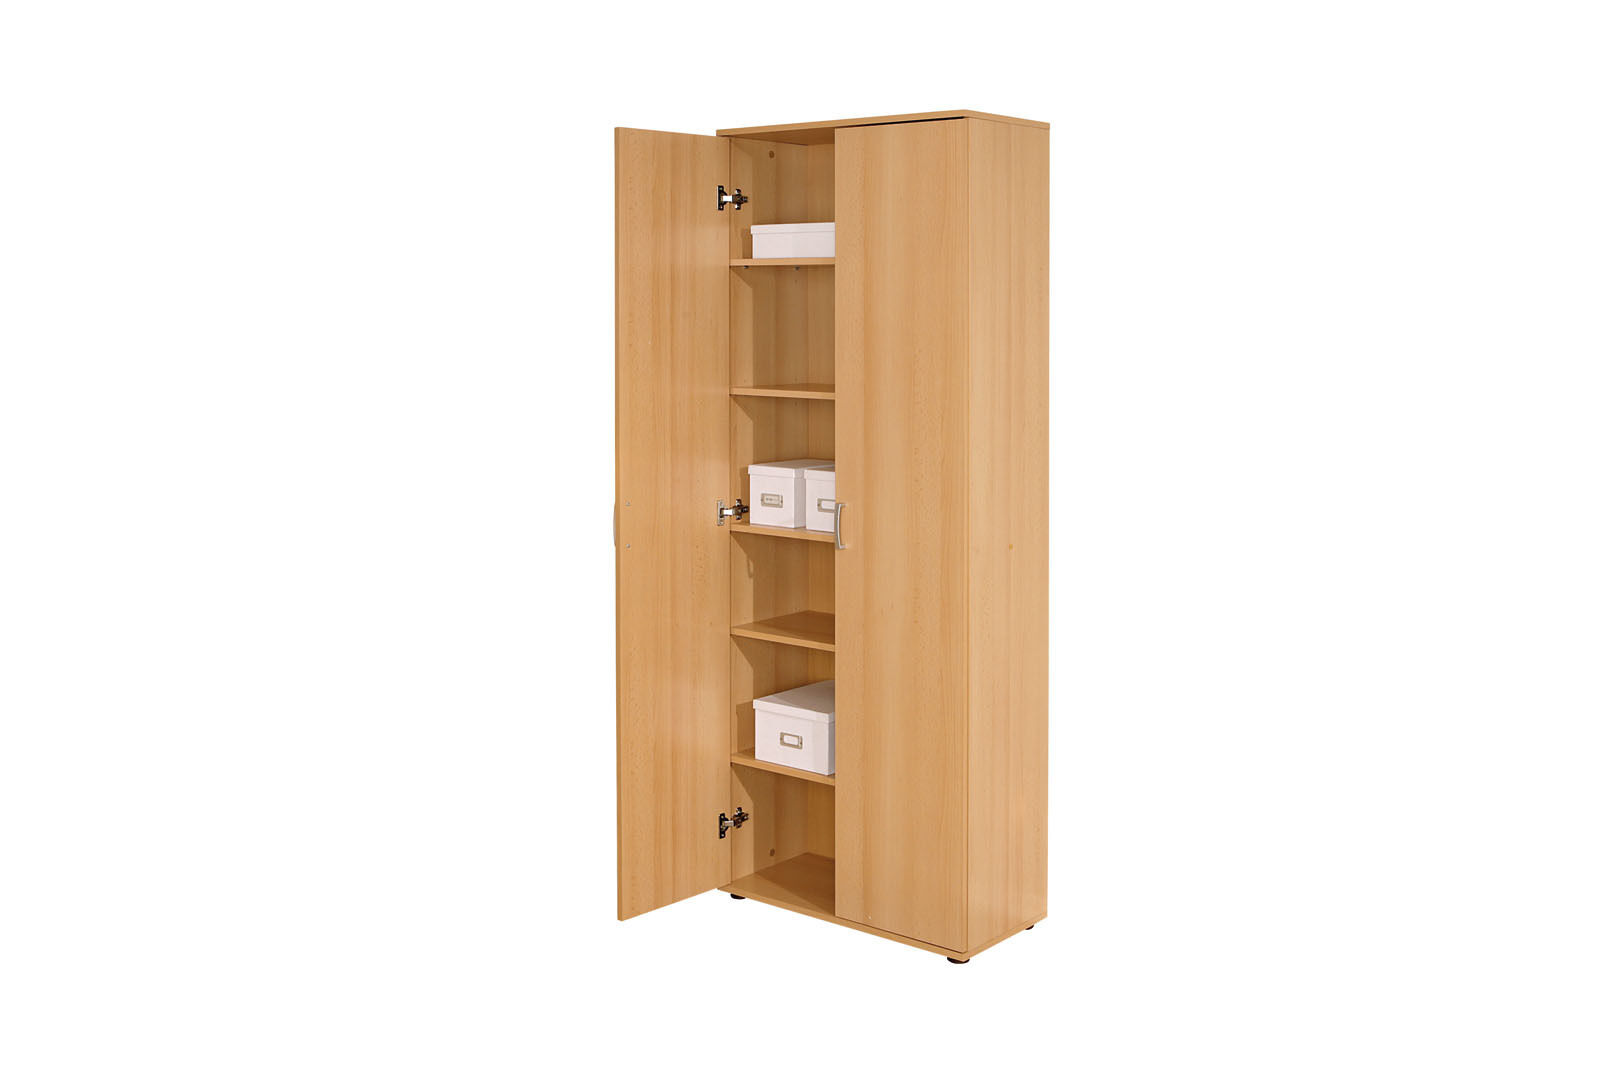 schrank aktenschrank buche b roschrank b ro mehrzweckschrank 2 t rig 5 b den neu eur 119 85. Black Bedroom Furniture Sets. Home Design Ideas